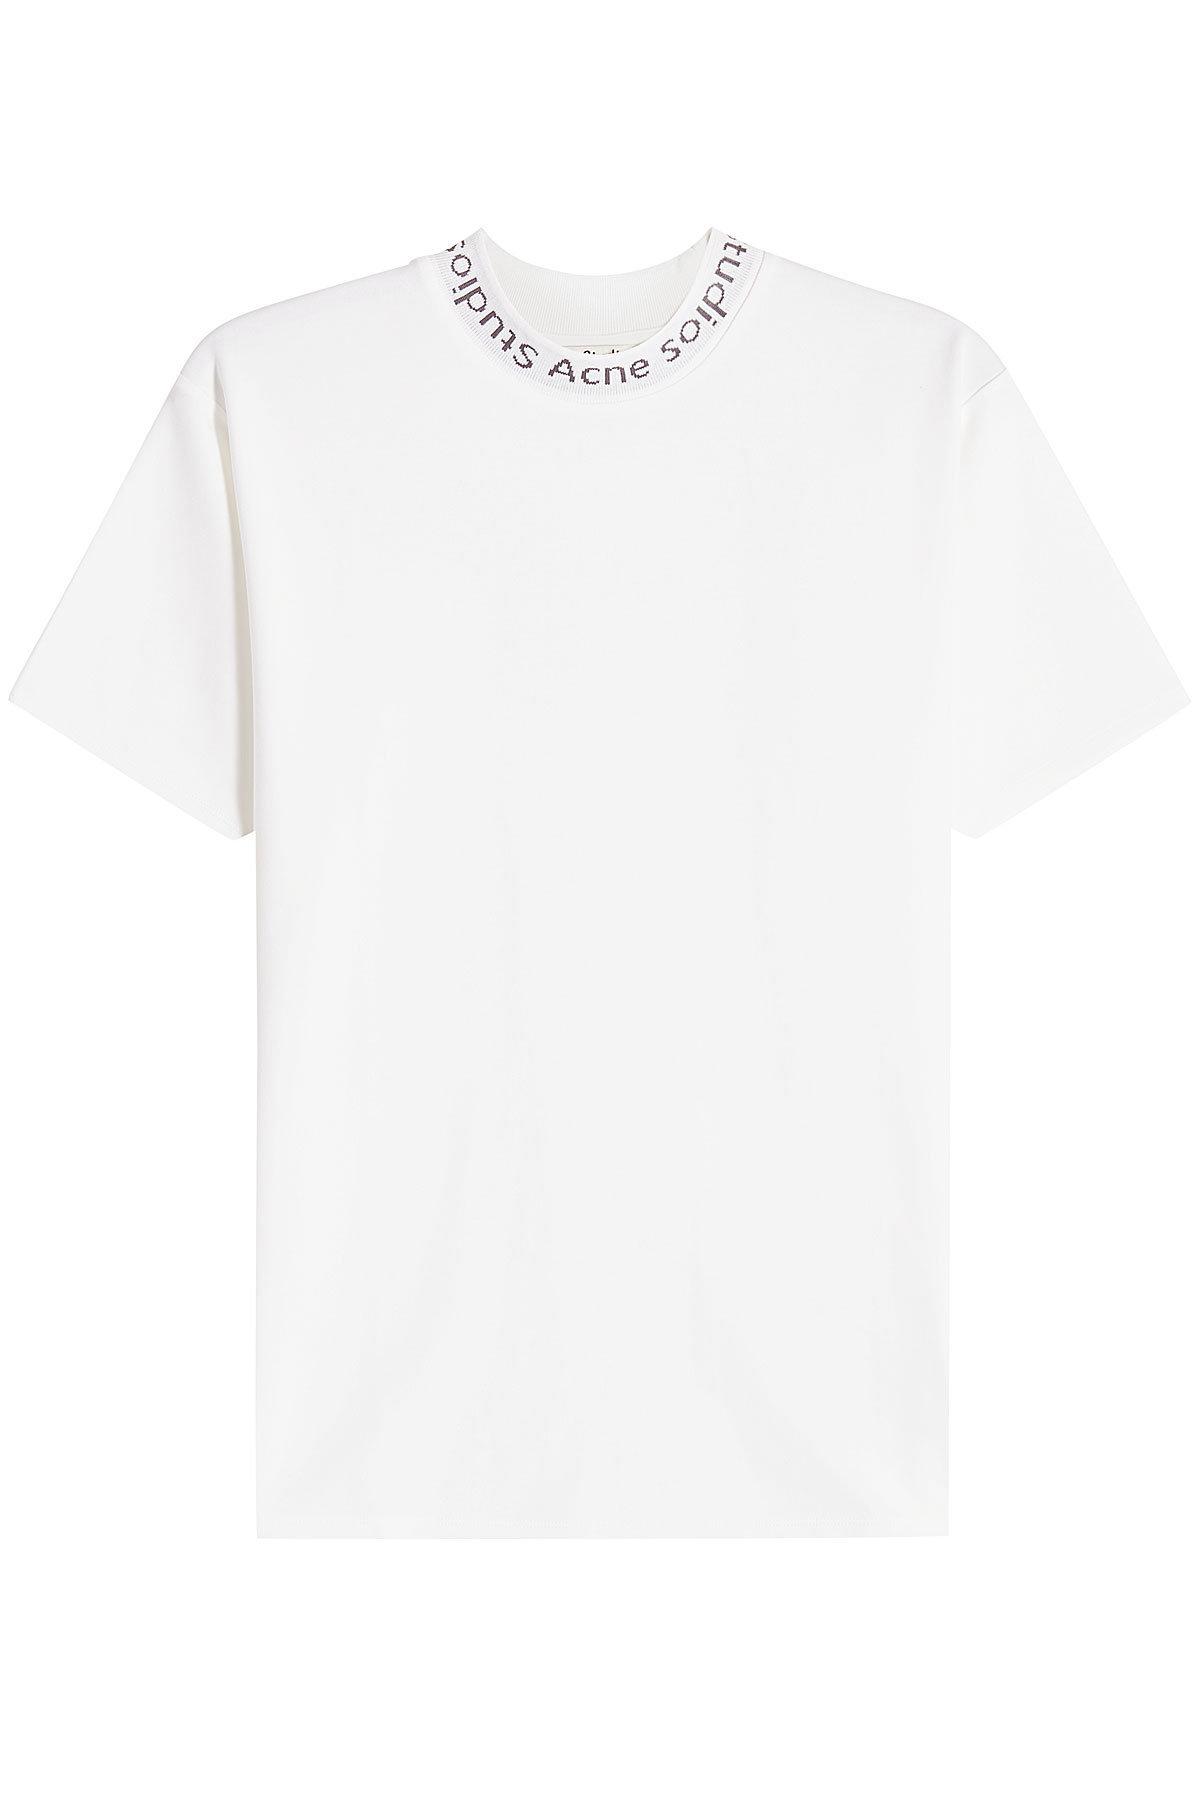 Navid T-Shirt | ACNE STUDIOS